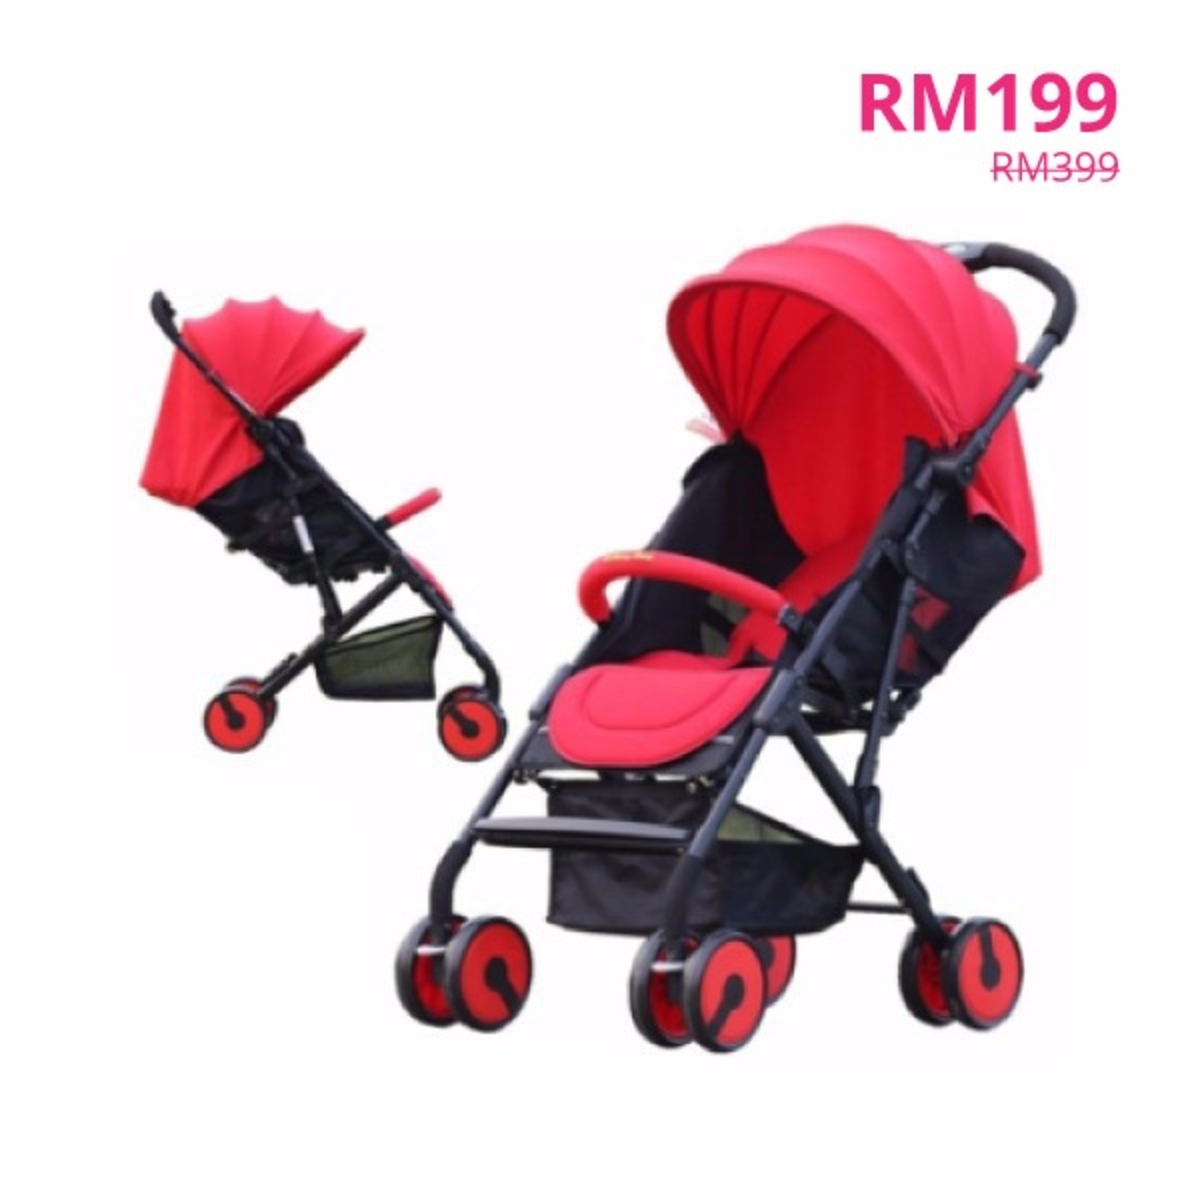 sokano premium lightweight compact foldable stroller go shop